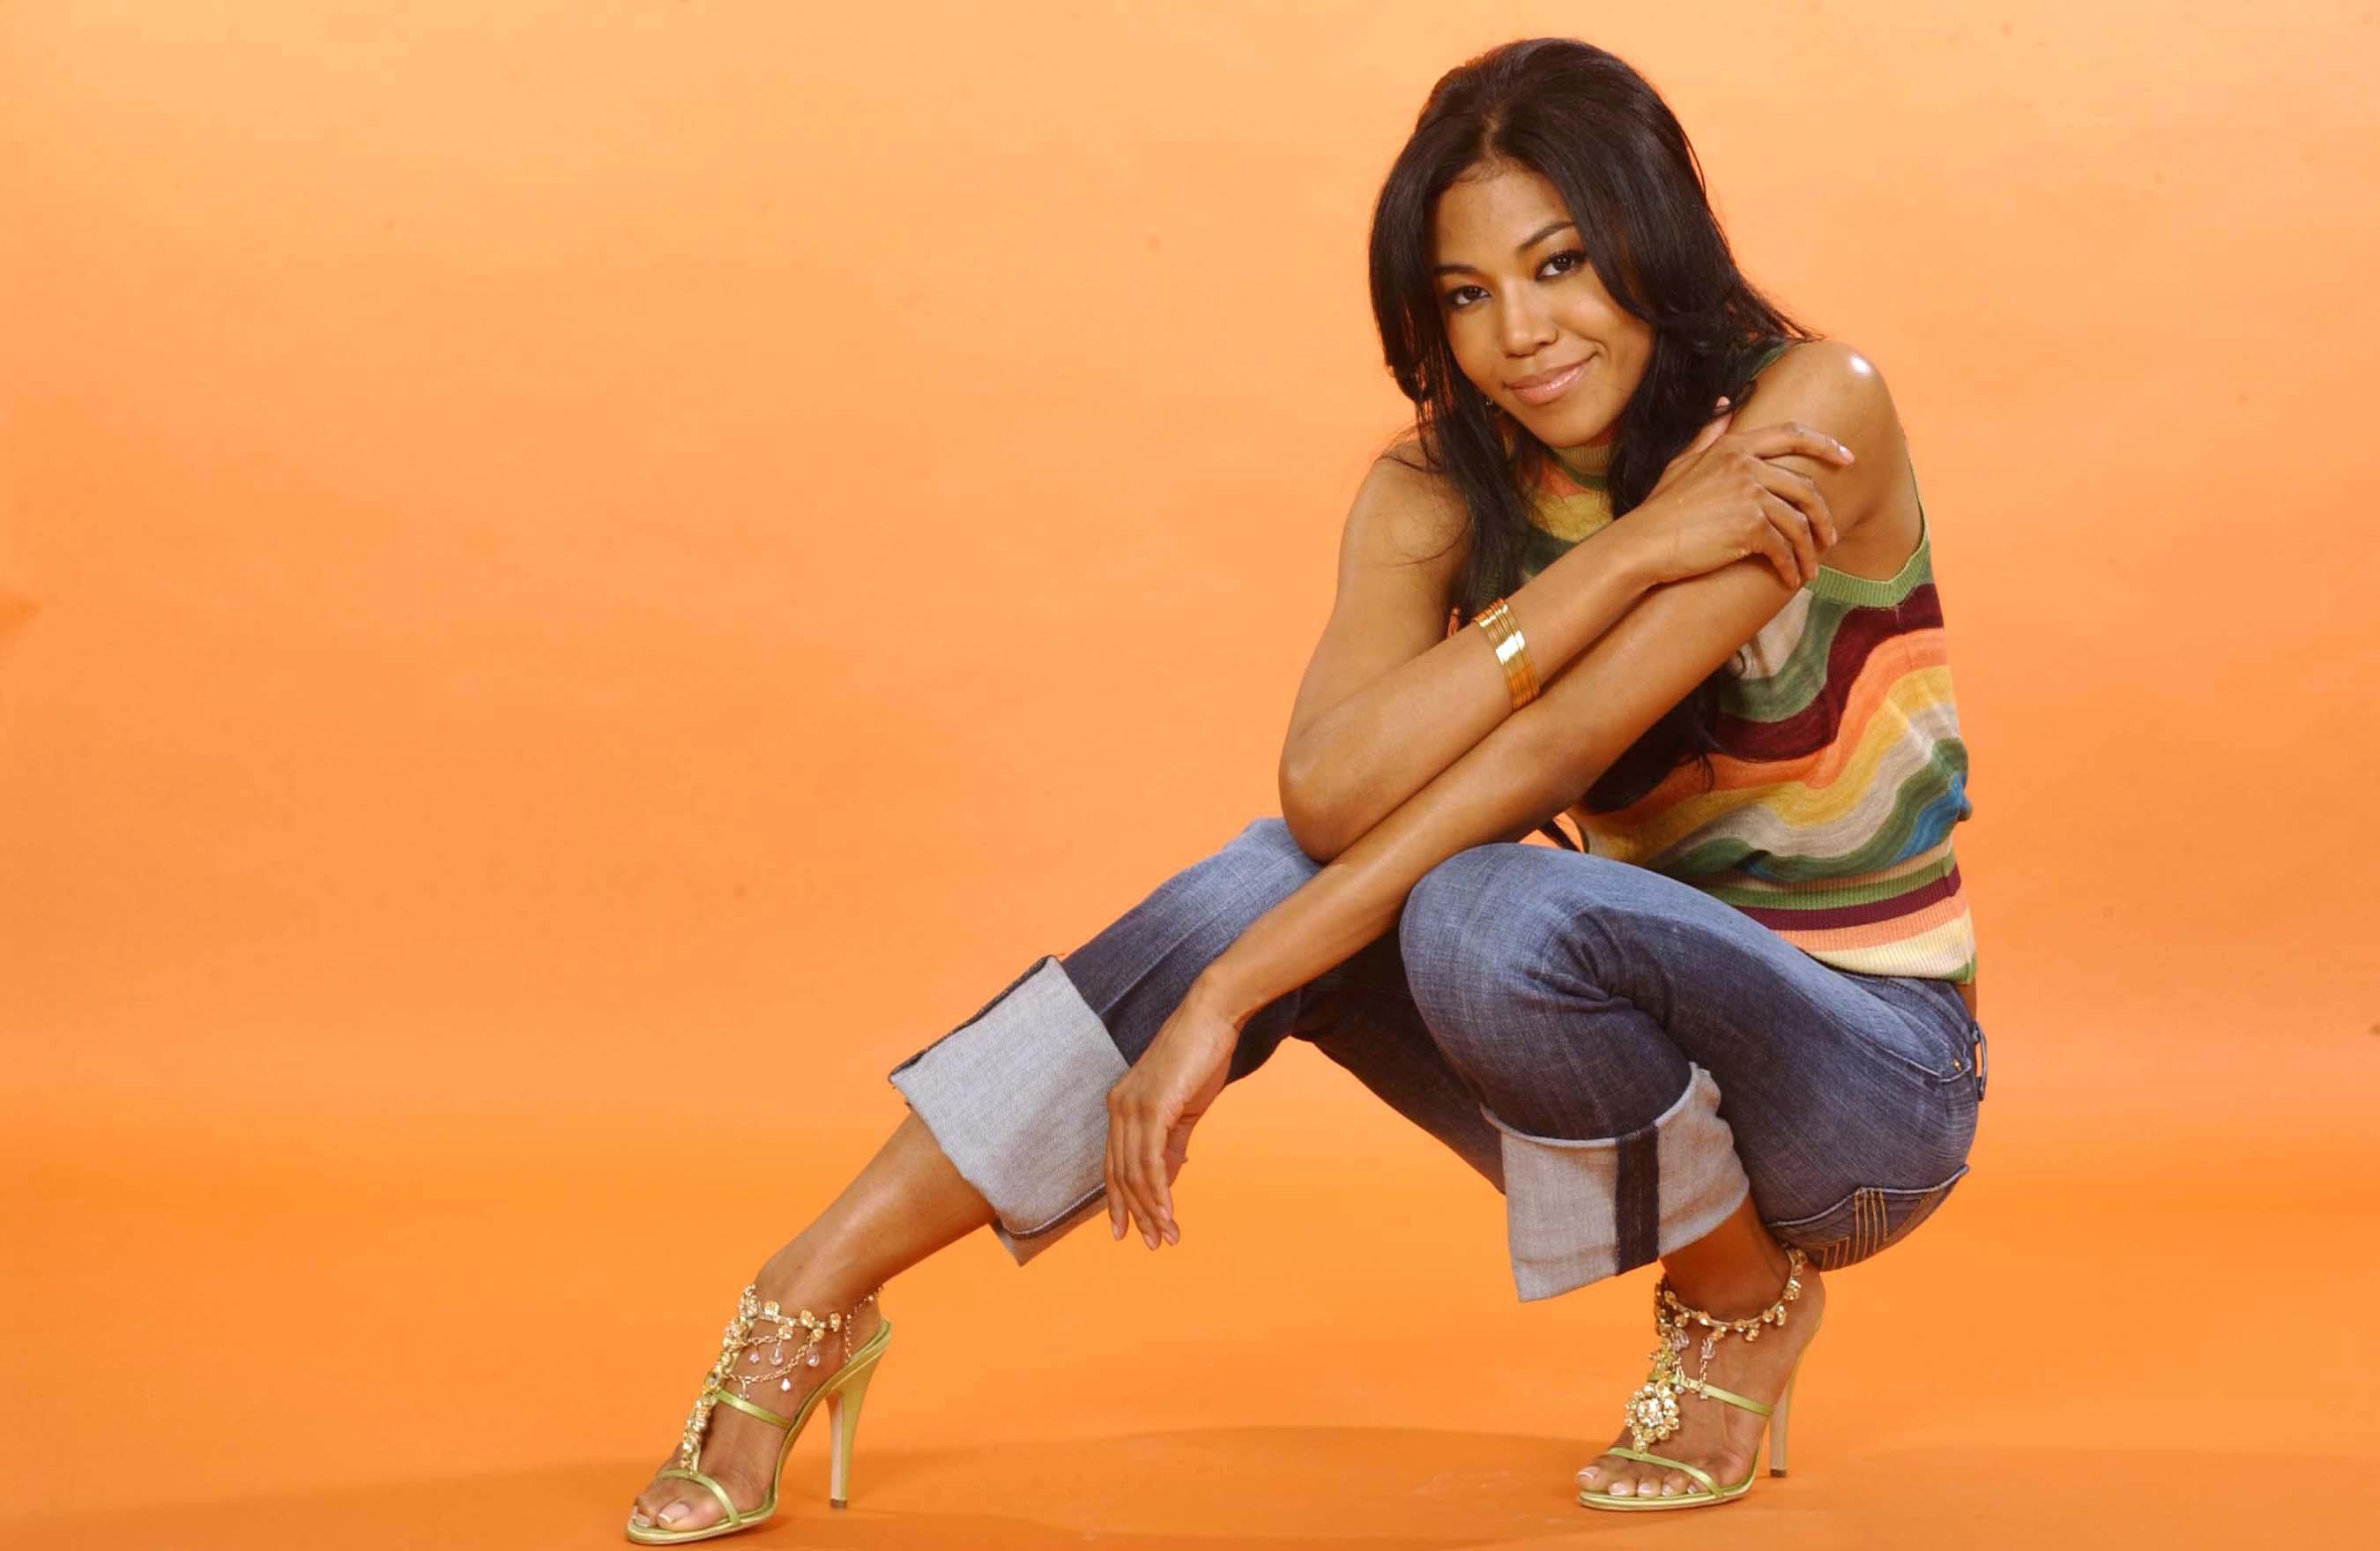 Nila (alias for Meera Chopra),Annabelle Wallis Porno tube 5. Rihanna,Bobbie Eakes born July 25, 1961 (age 57)